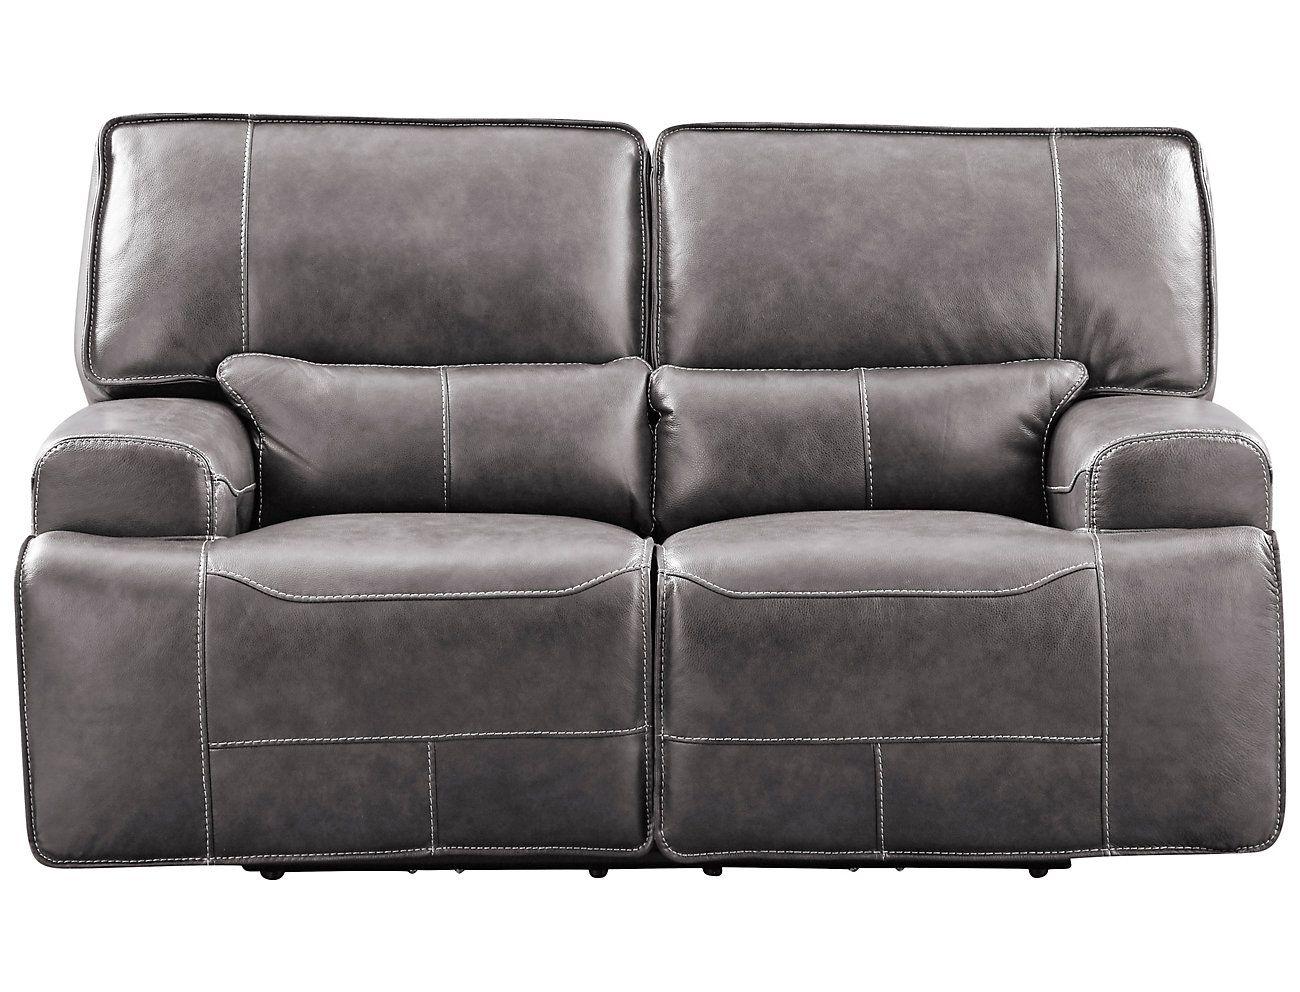 Dylan Leather Power Loveseat Grey Large Love Seat Mattress Furniture Leather Loveseat